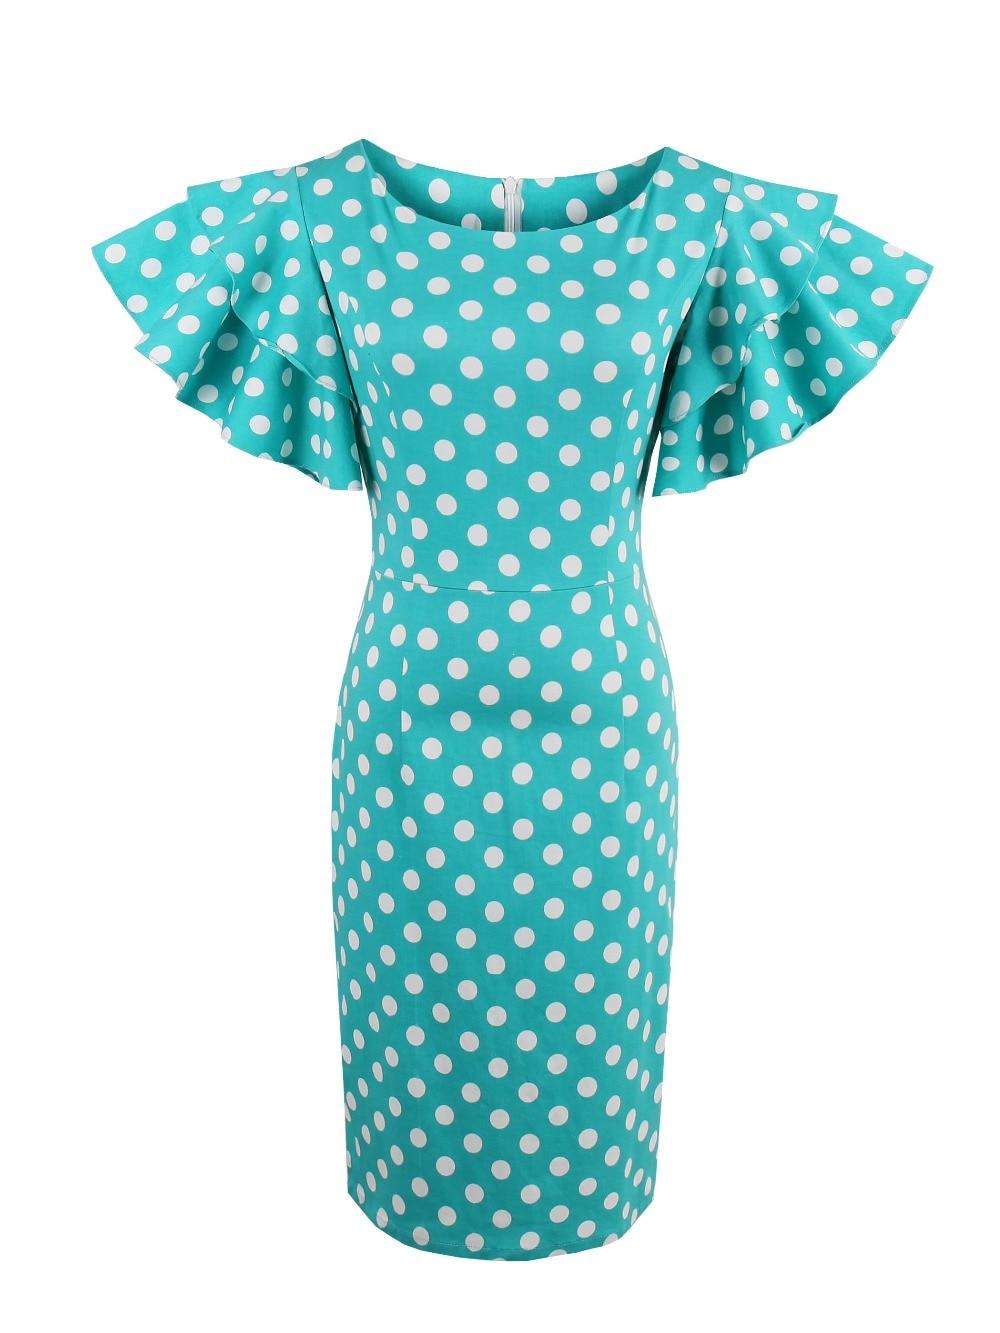 Brand Summer Women Dress Maternity wear New Design Bow Clothes Dress Vintage Femme Clothing Vestido Infantil